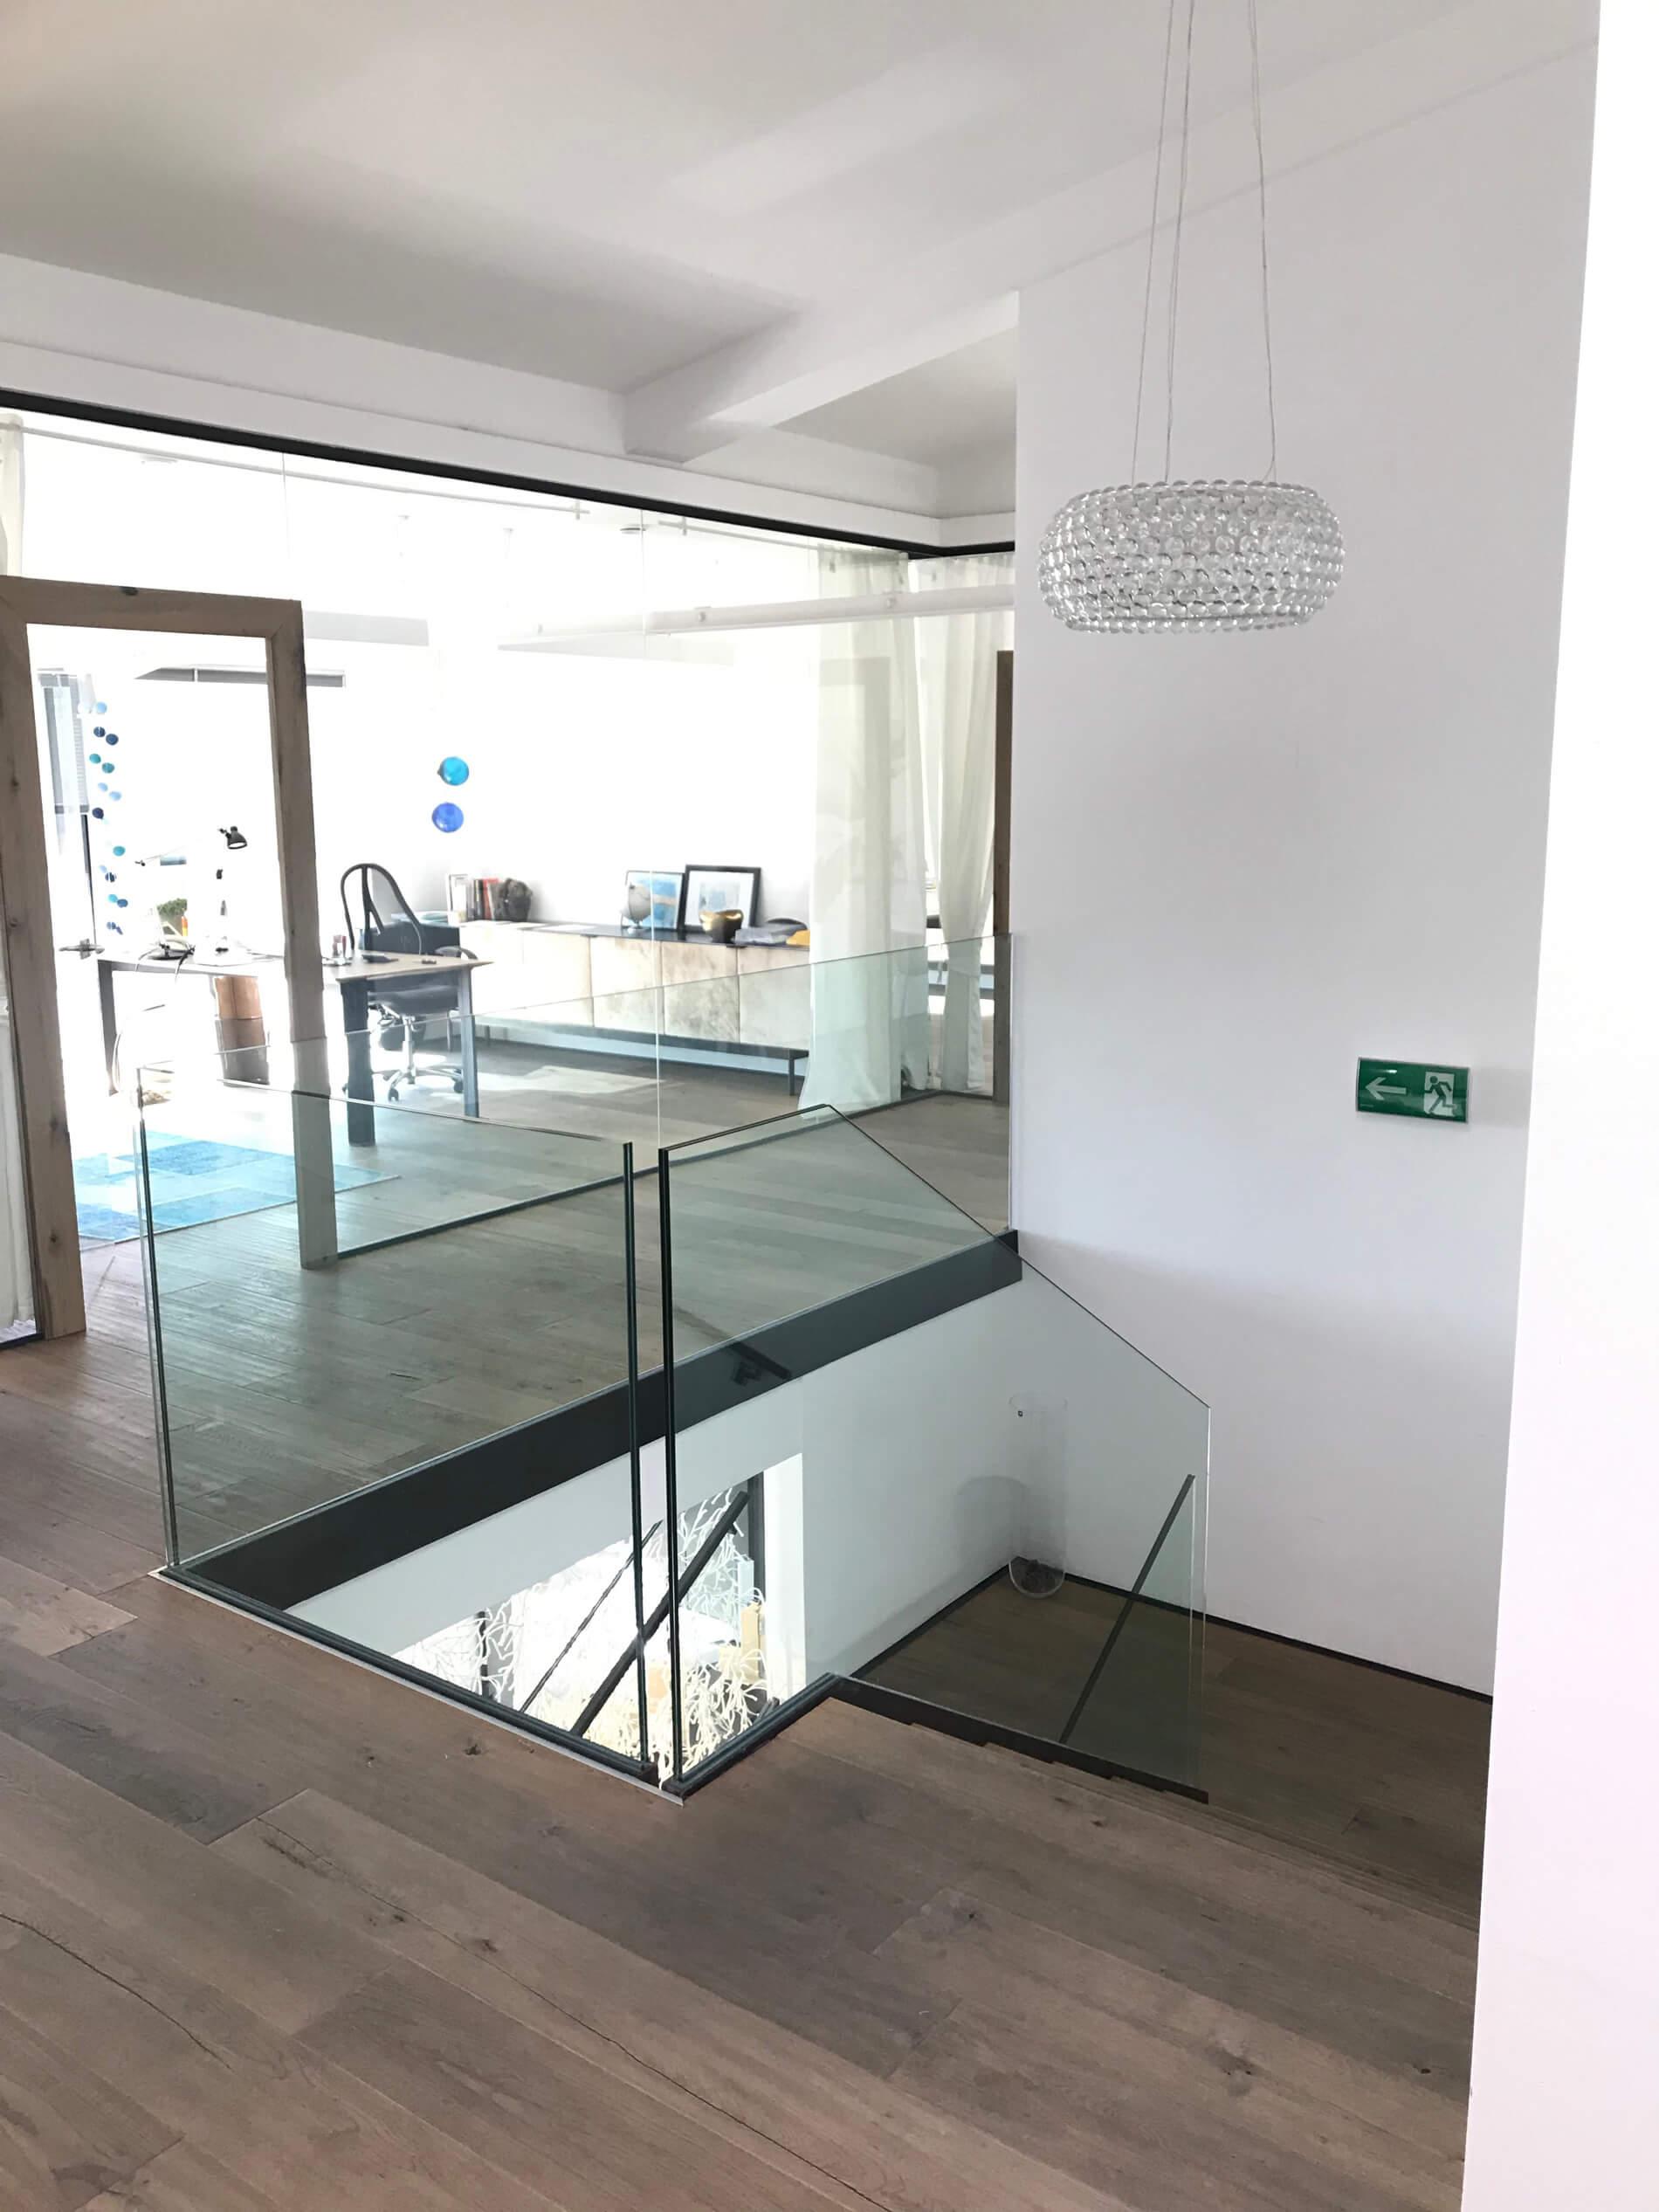 Verglasungen Innenraum